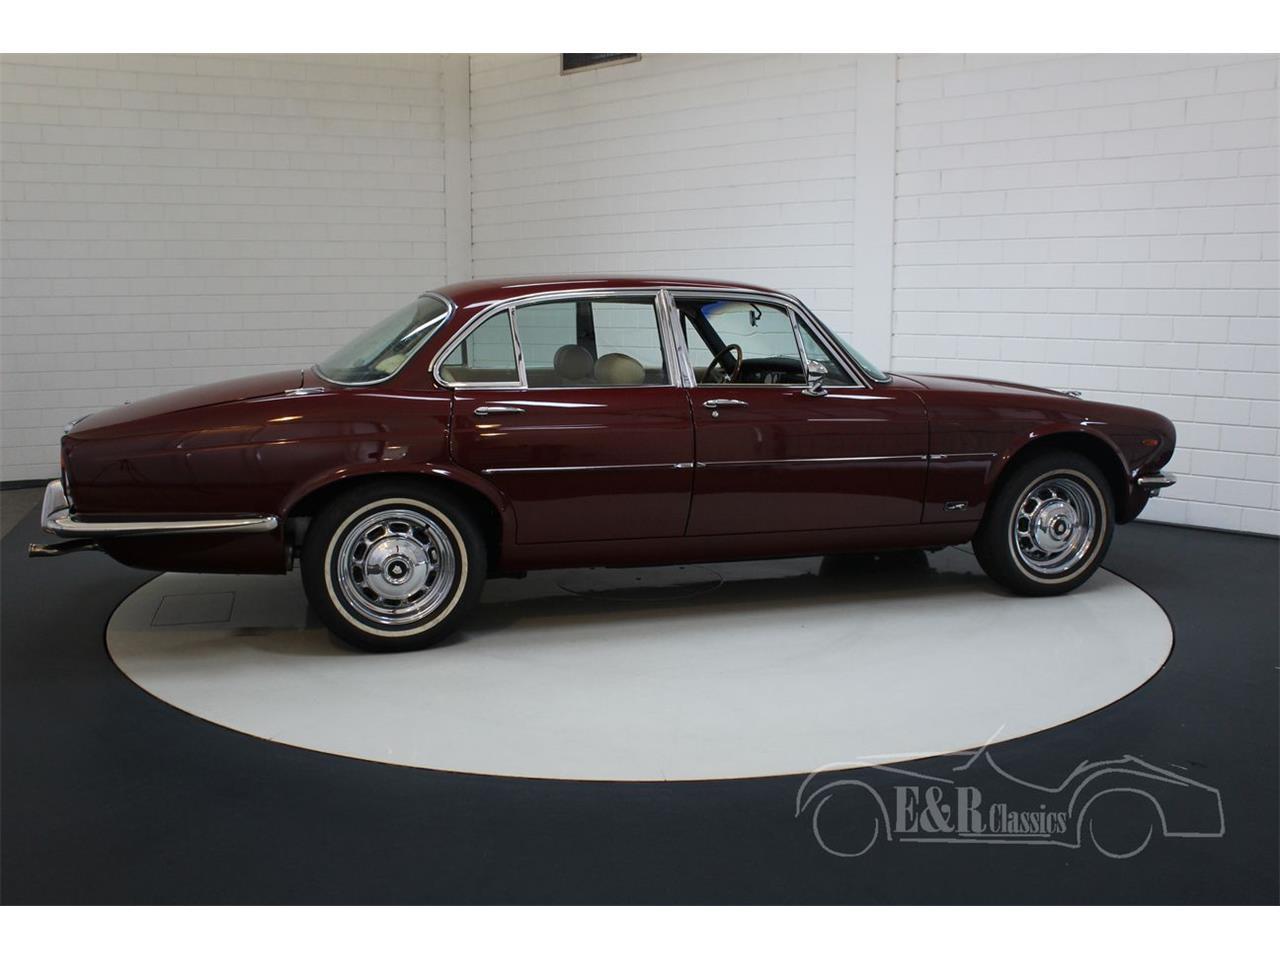 1974 Jaguar XJ6 (CC-1414372) for sale in Waalwijk, [nl] Pays-Bas